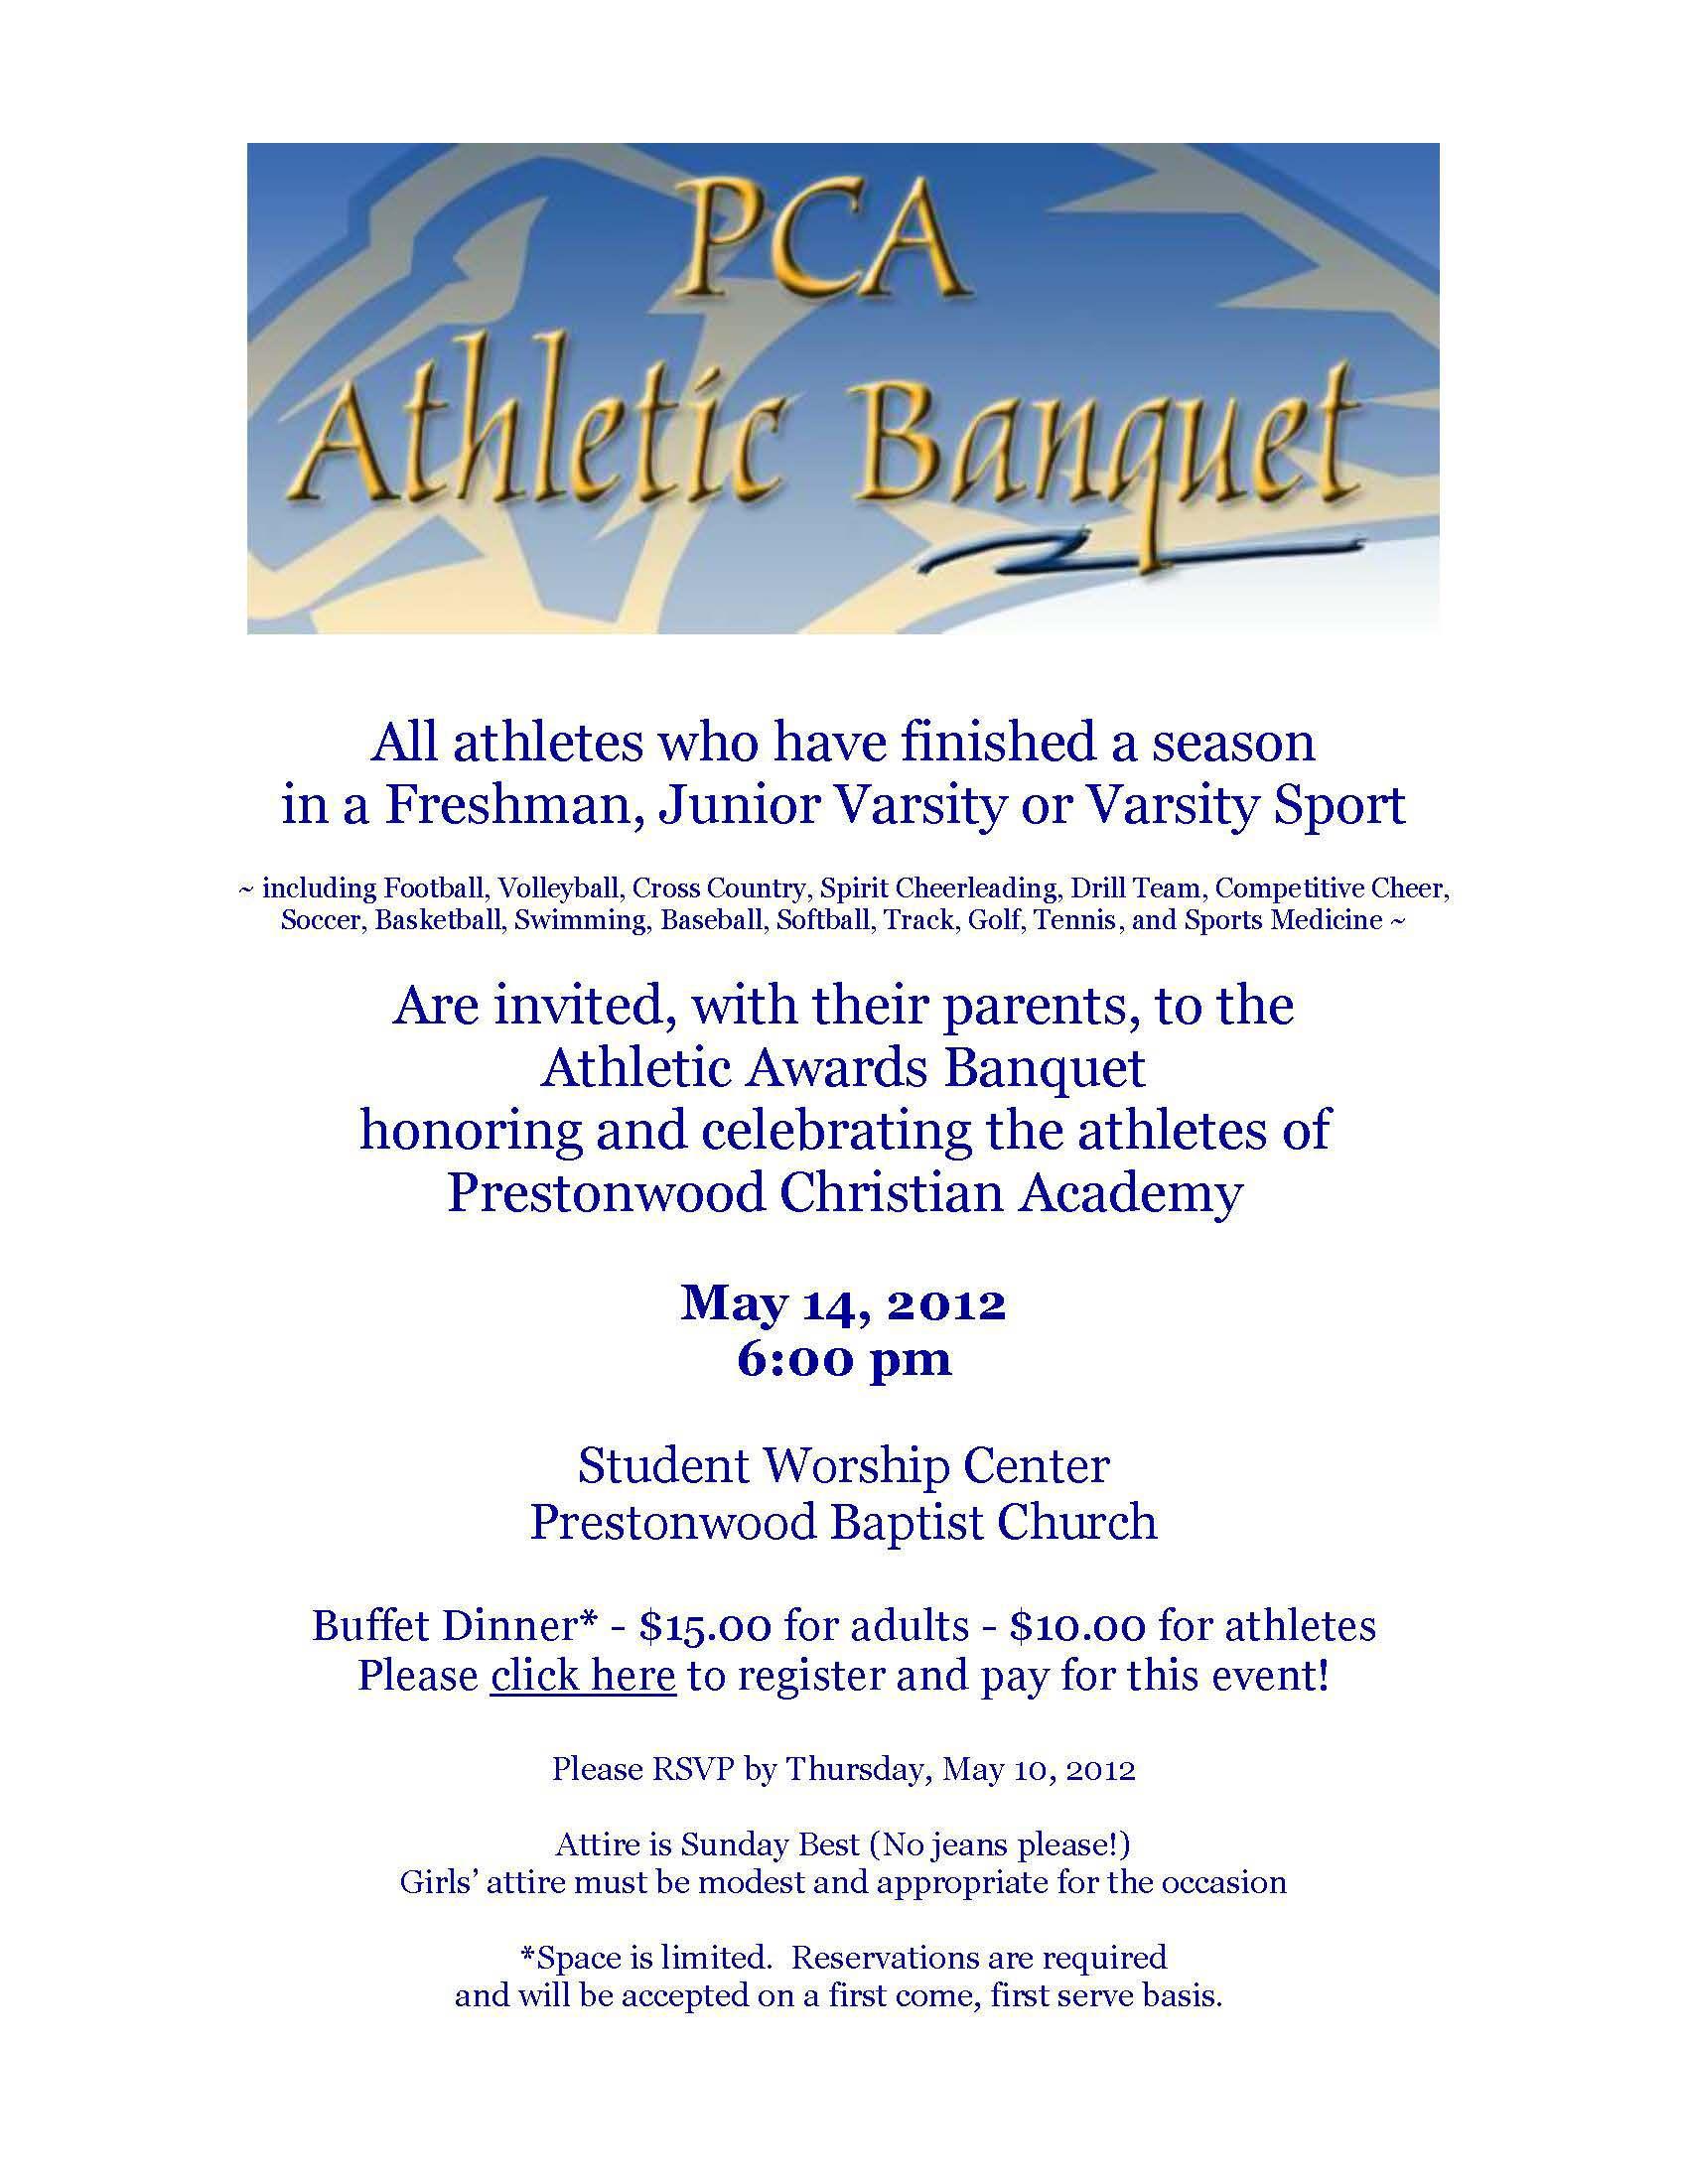 Sports Banquet Invitation Wording